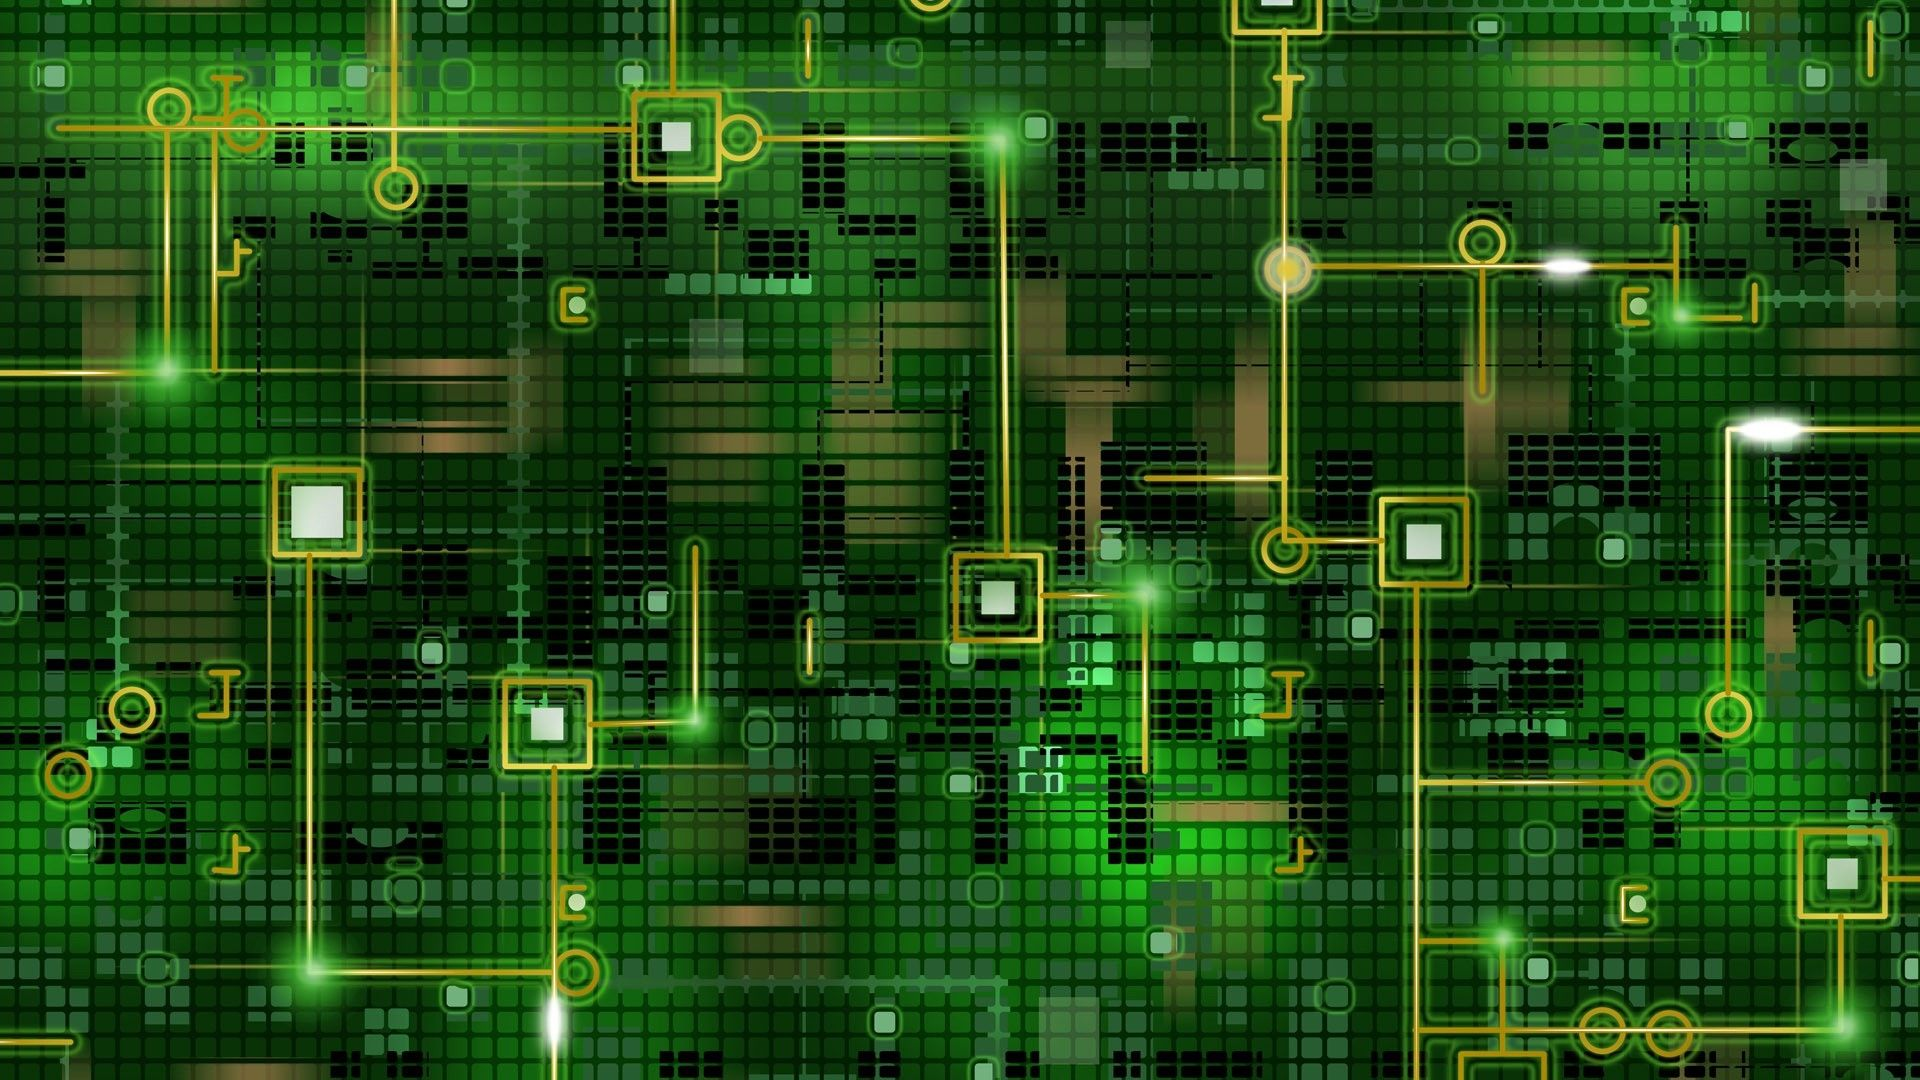 Chip Grid Background Black Green Line Circuit 36221 1920x1080 Jpg 1920 1080 Computer Wallpaper Digital Wallpaper Abstract Wallpaper